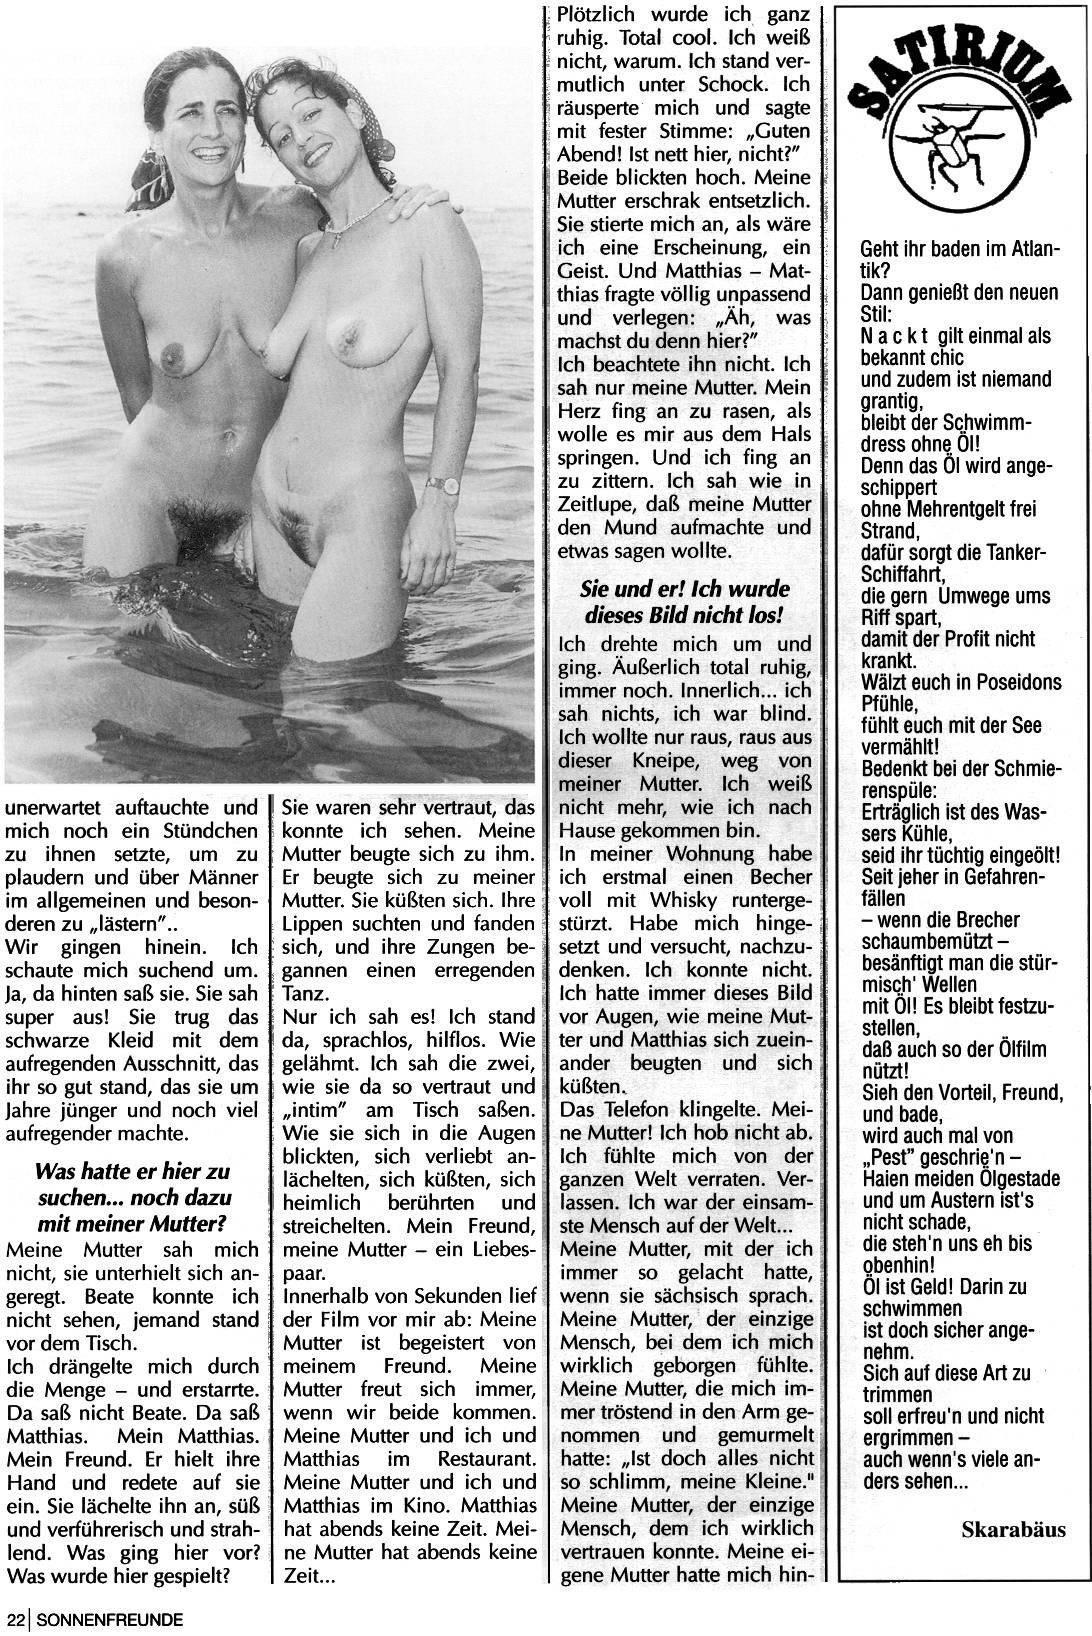 Nudist Magazines Sonnenfreunde 1993 Nr.7 - 1